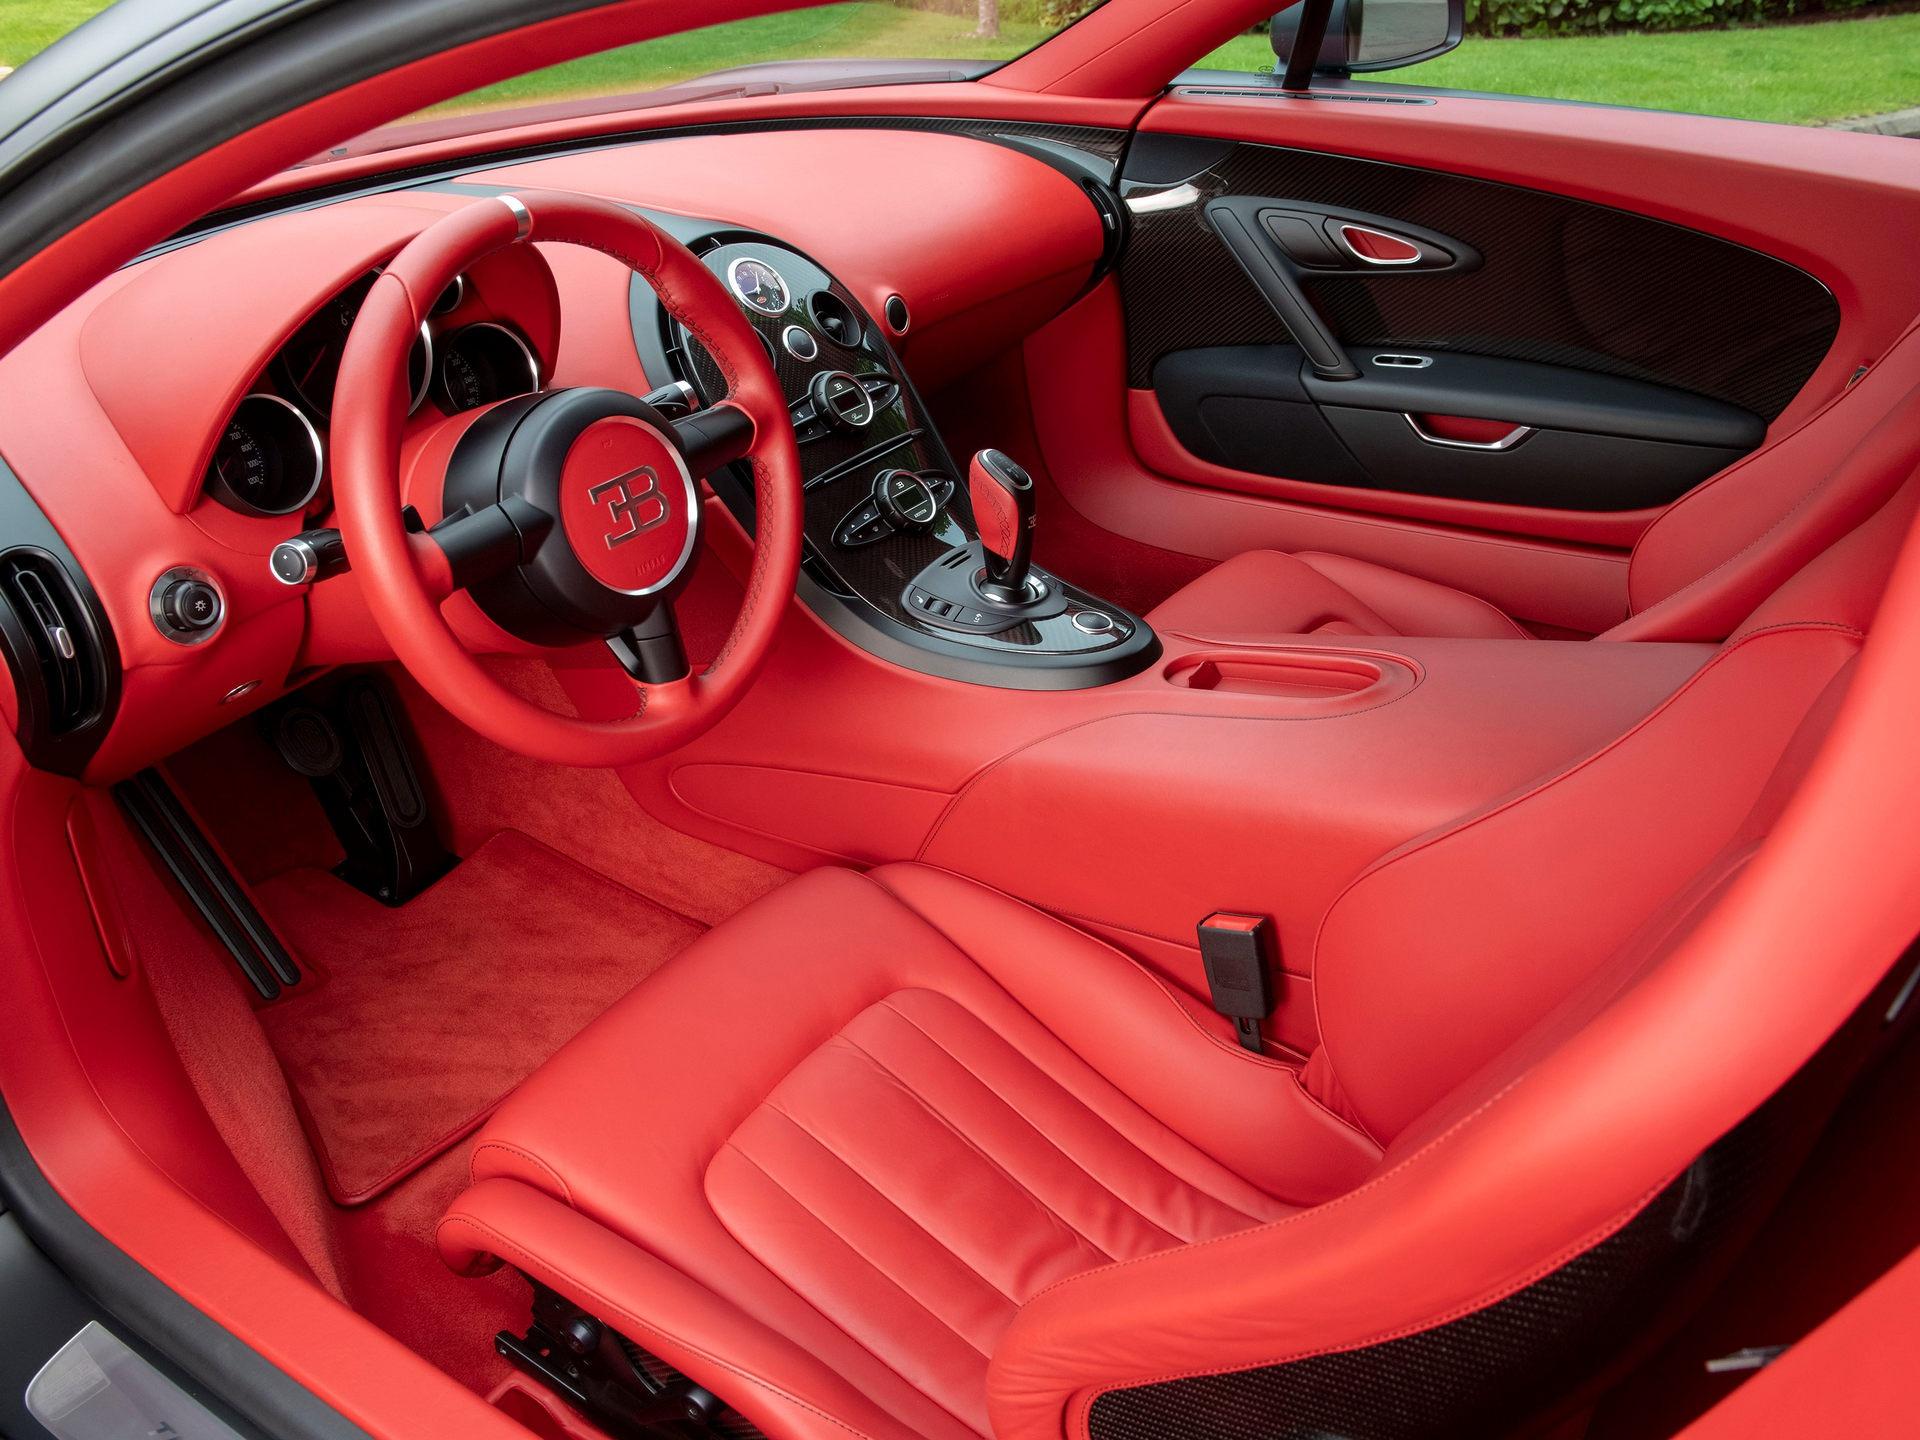 Bugatti Veyron Super Sport cuoi cung duoc rao ban anh 6